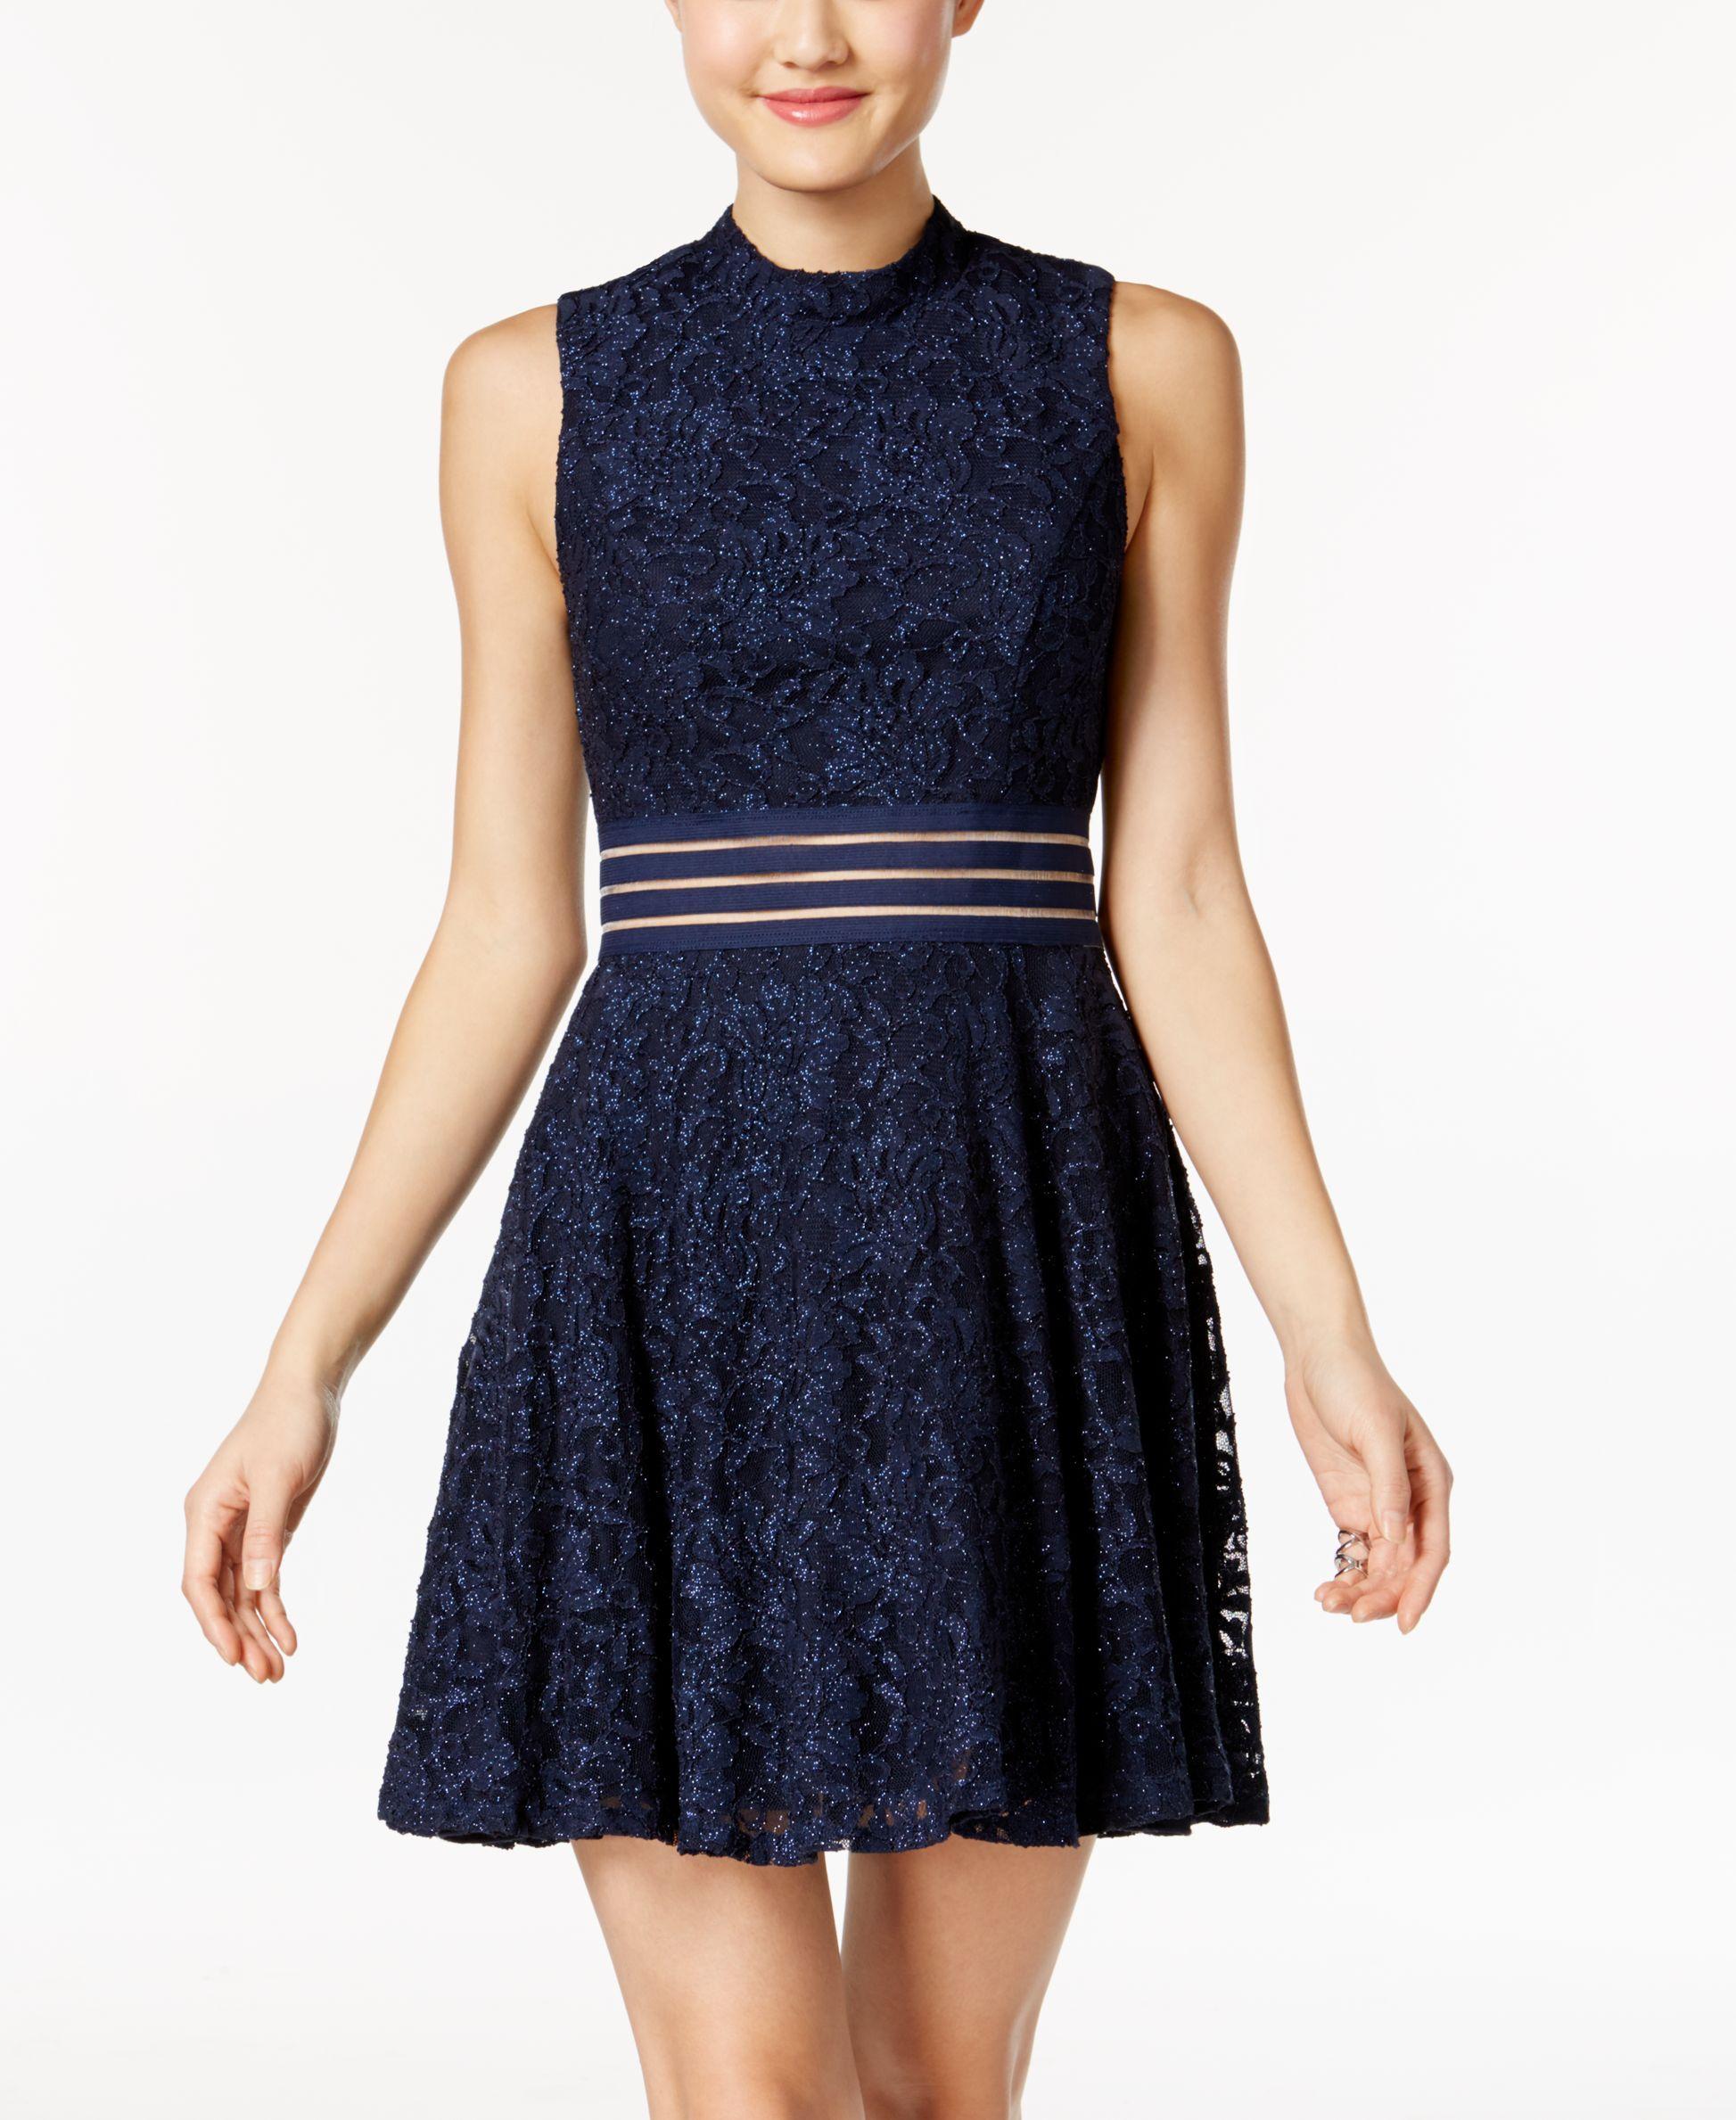 City studios juniorsu glitter lace illusion party dress products